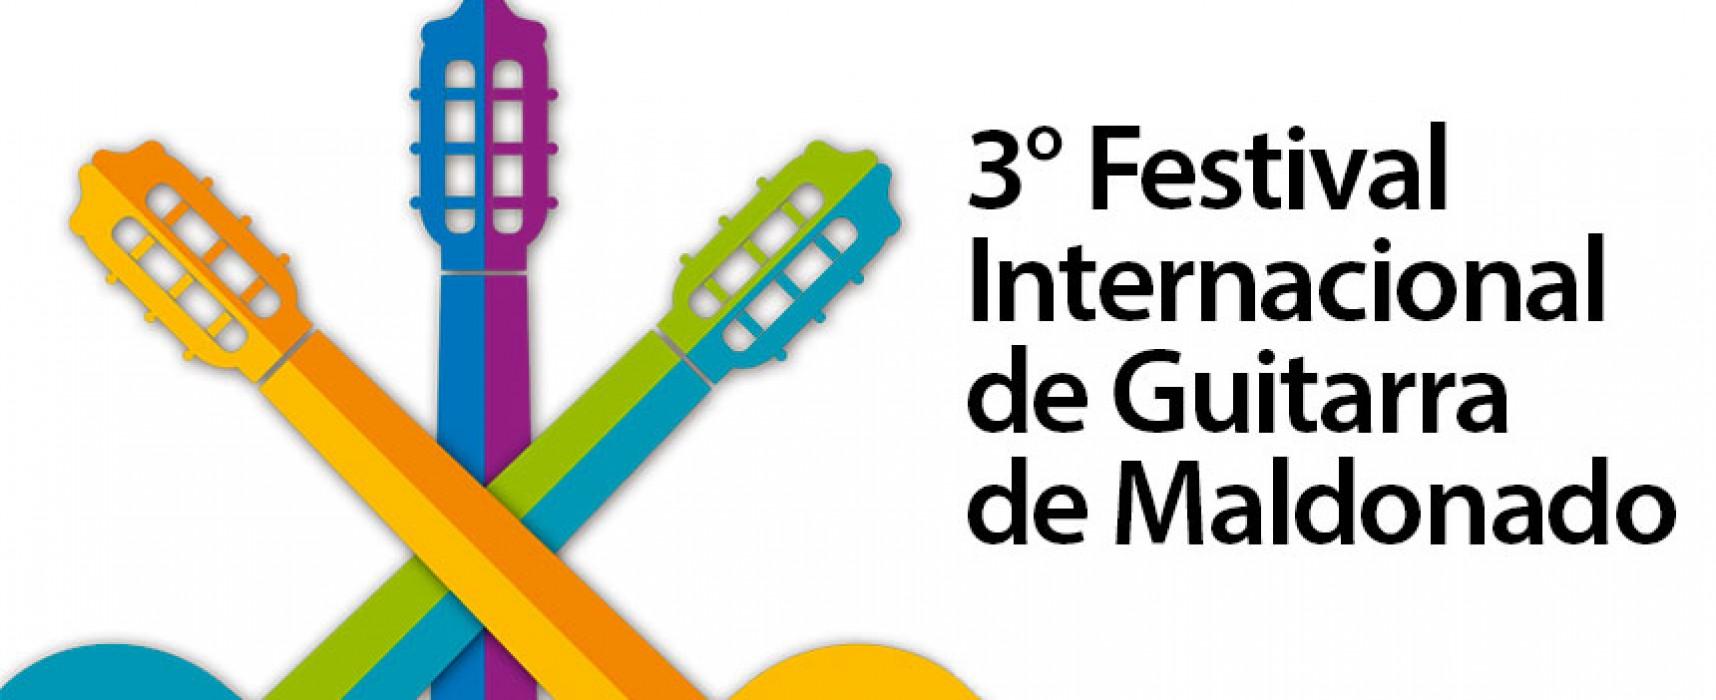 3° Festival Internacional de Guitarra de Maldonado